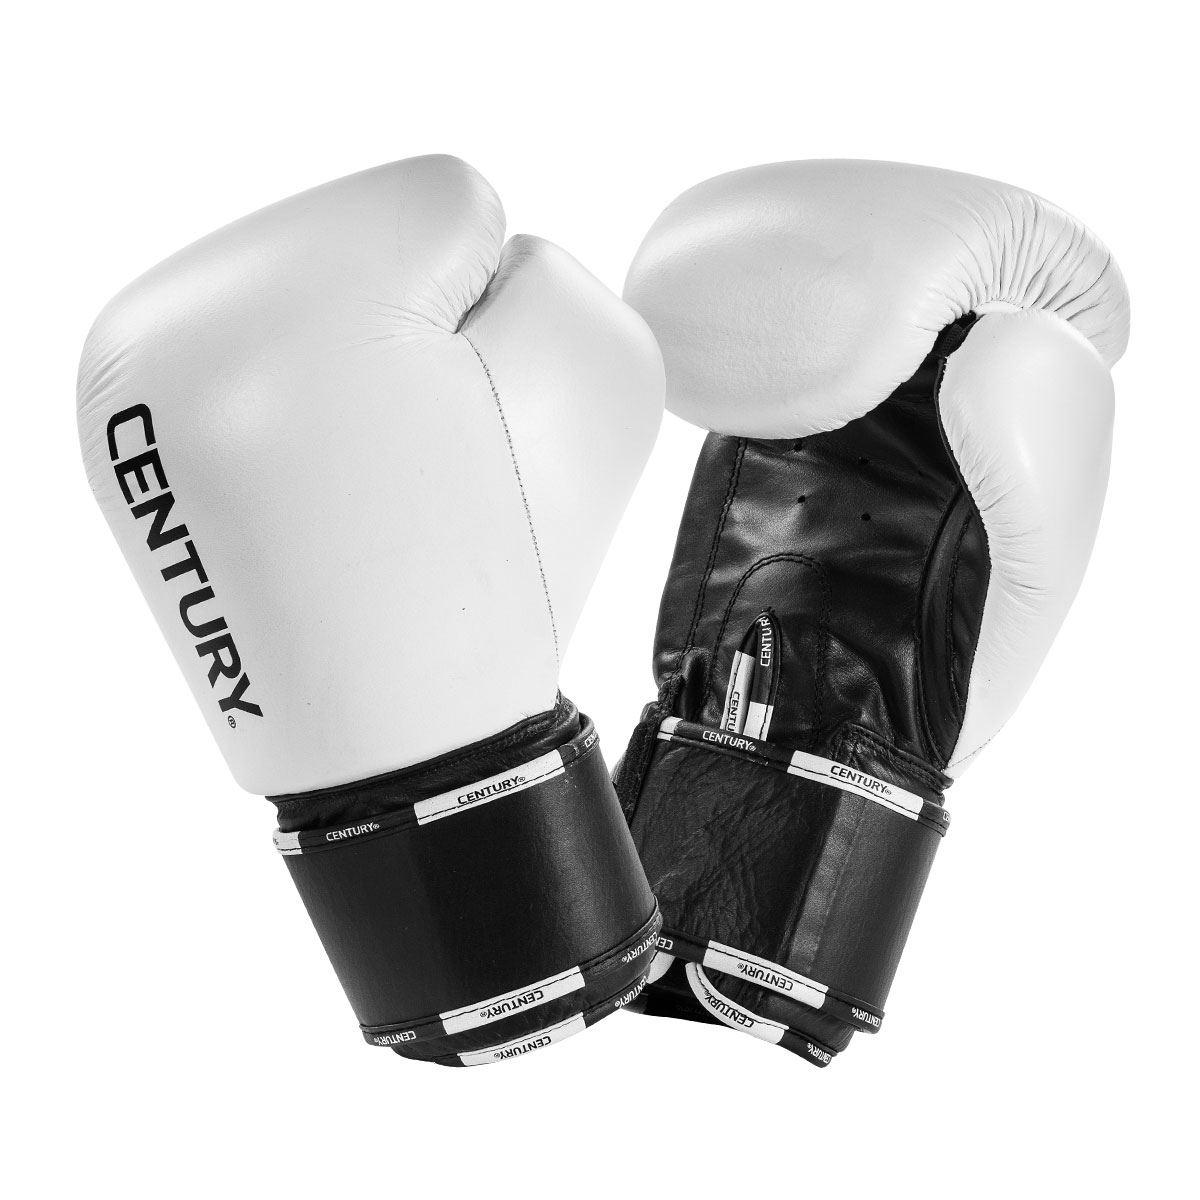 Century Creed Heavy Bag Gloves